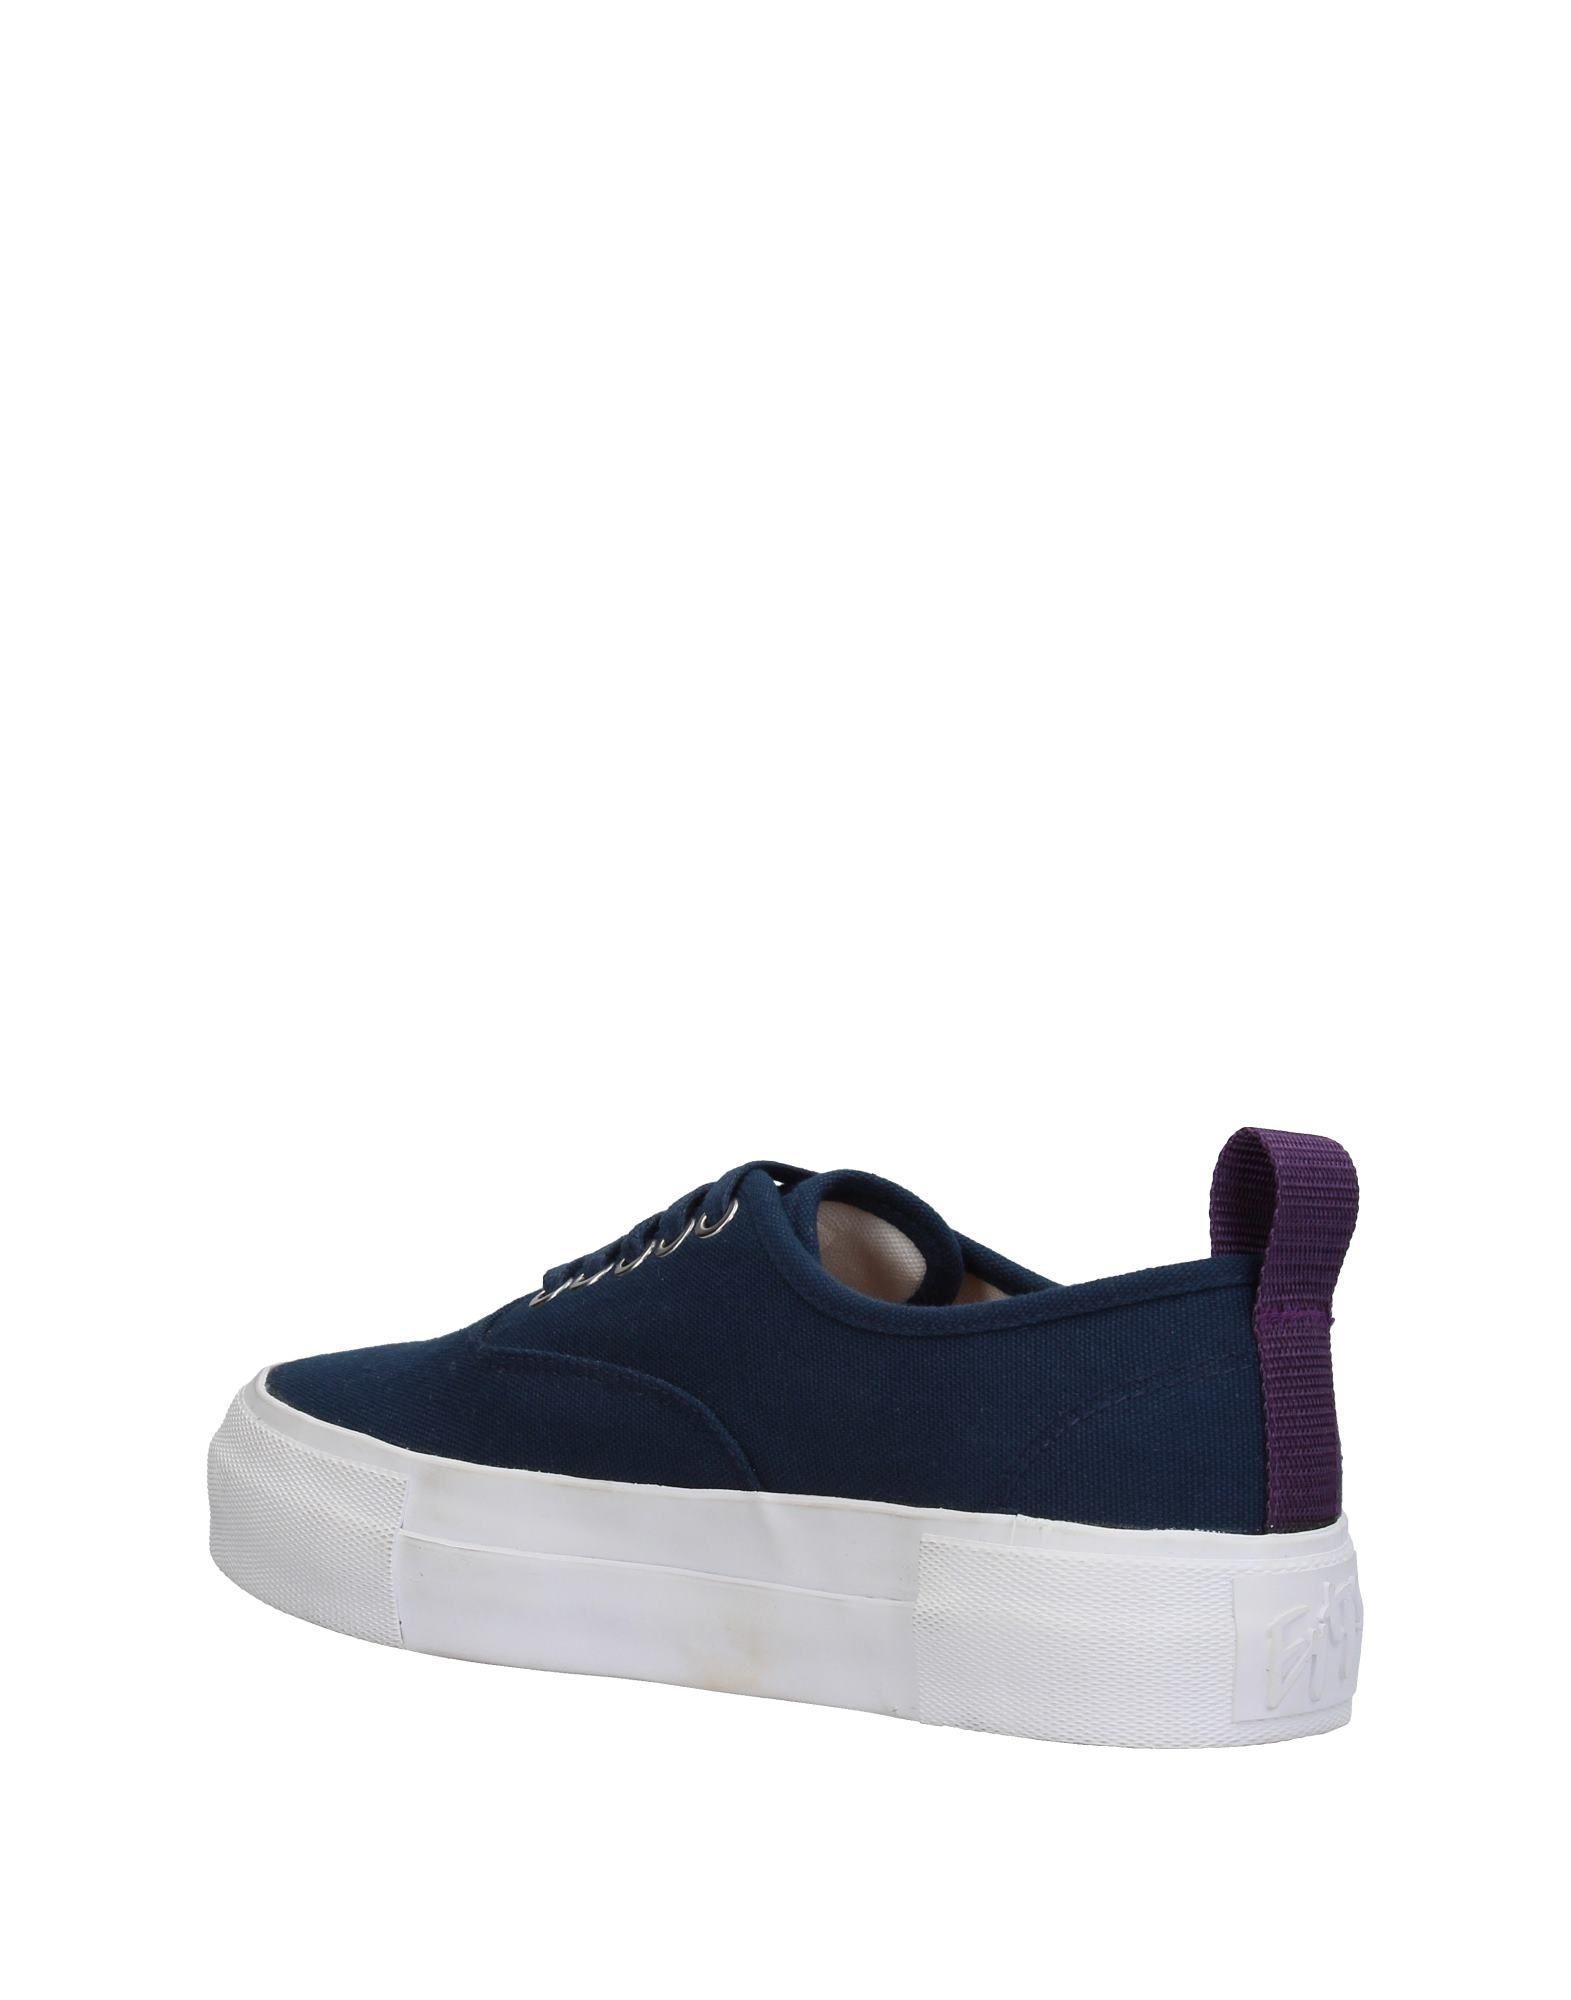 Eytys Canvas Low-tops & Sneakers in Dark Blue (Blue)